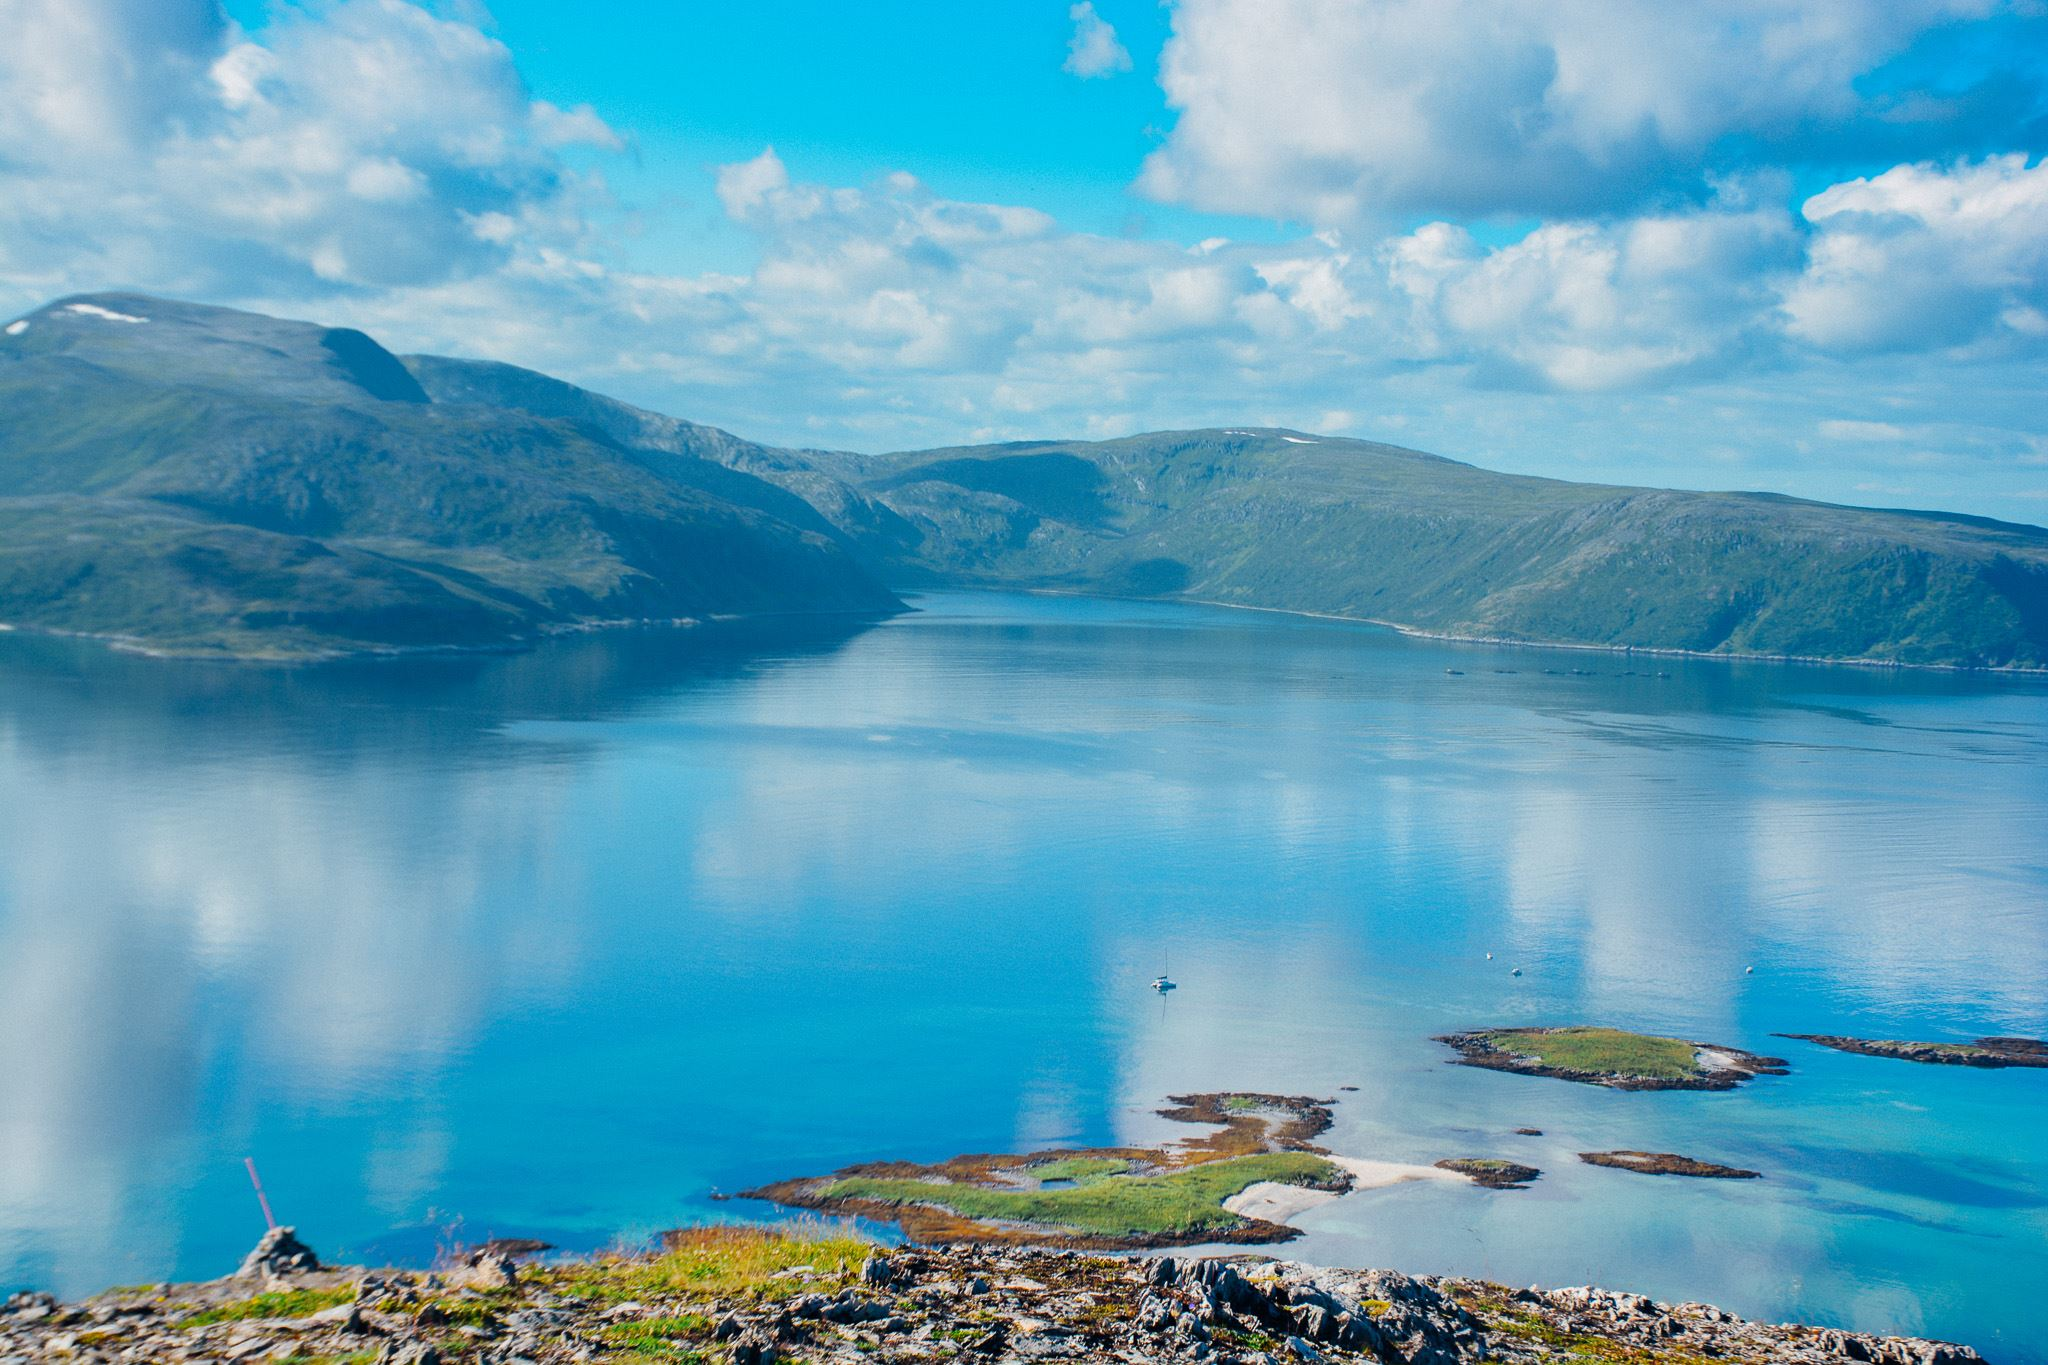 Tesla x Fjord Sightseeing